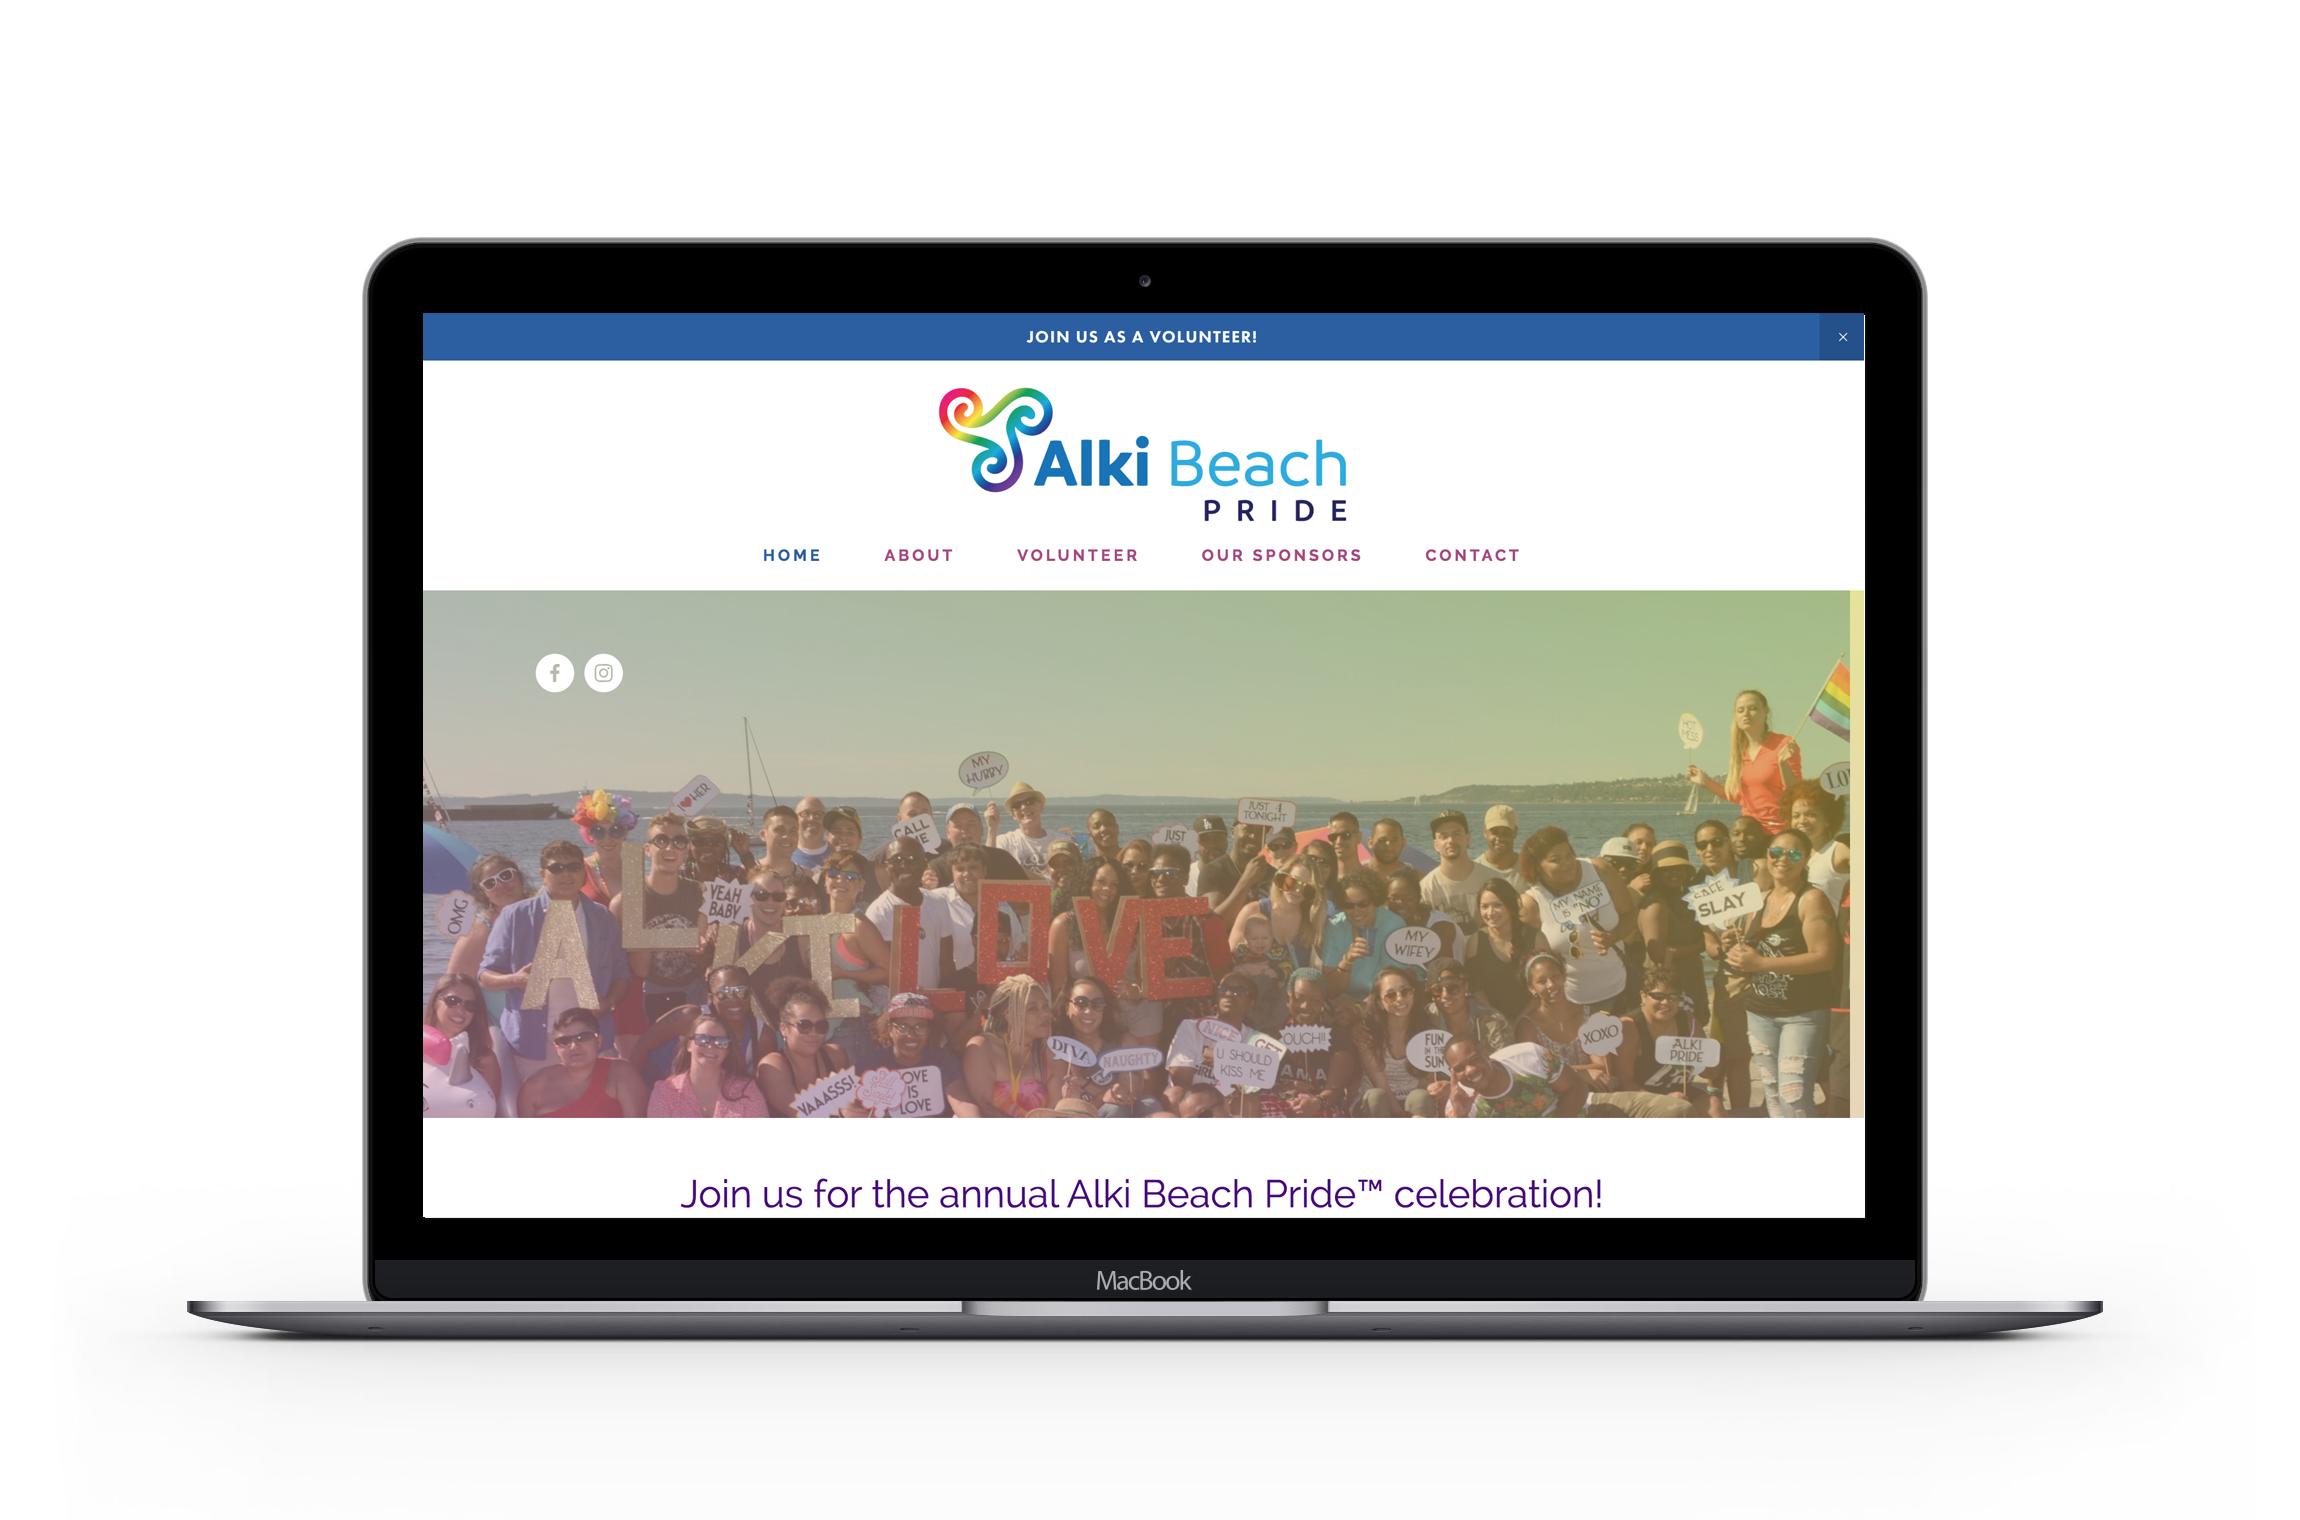 Website design by BusyBee.